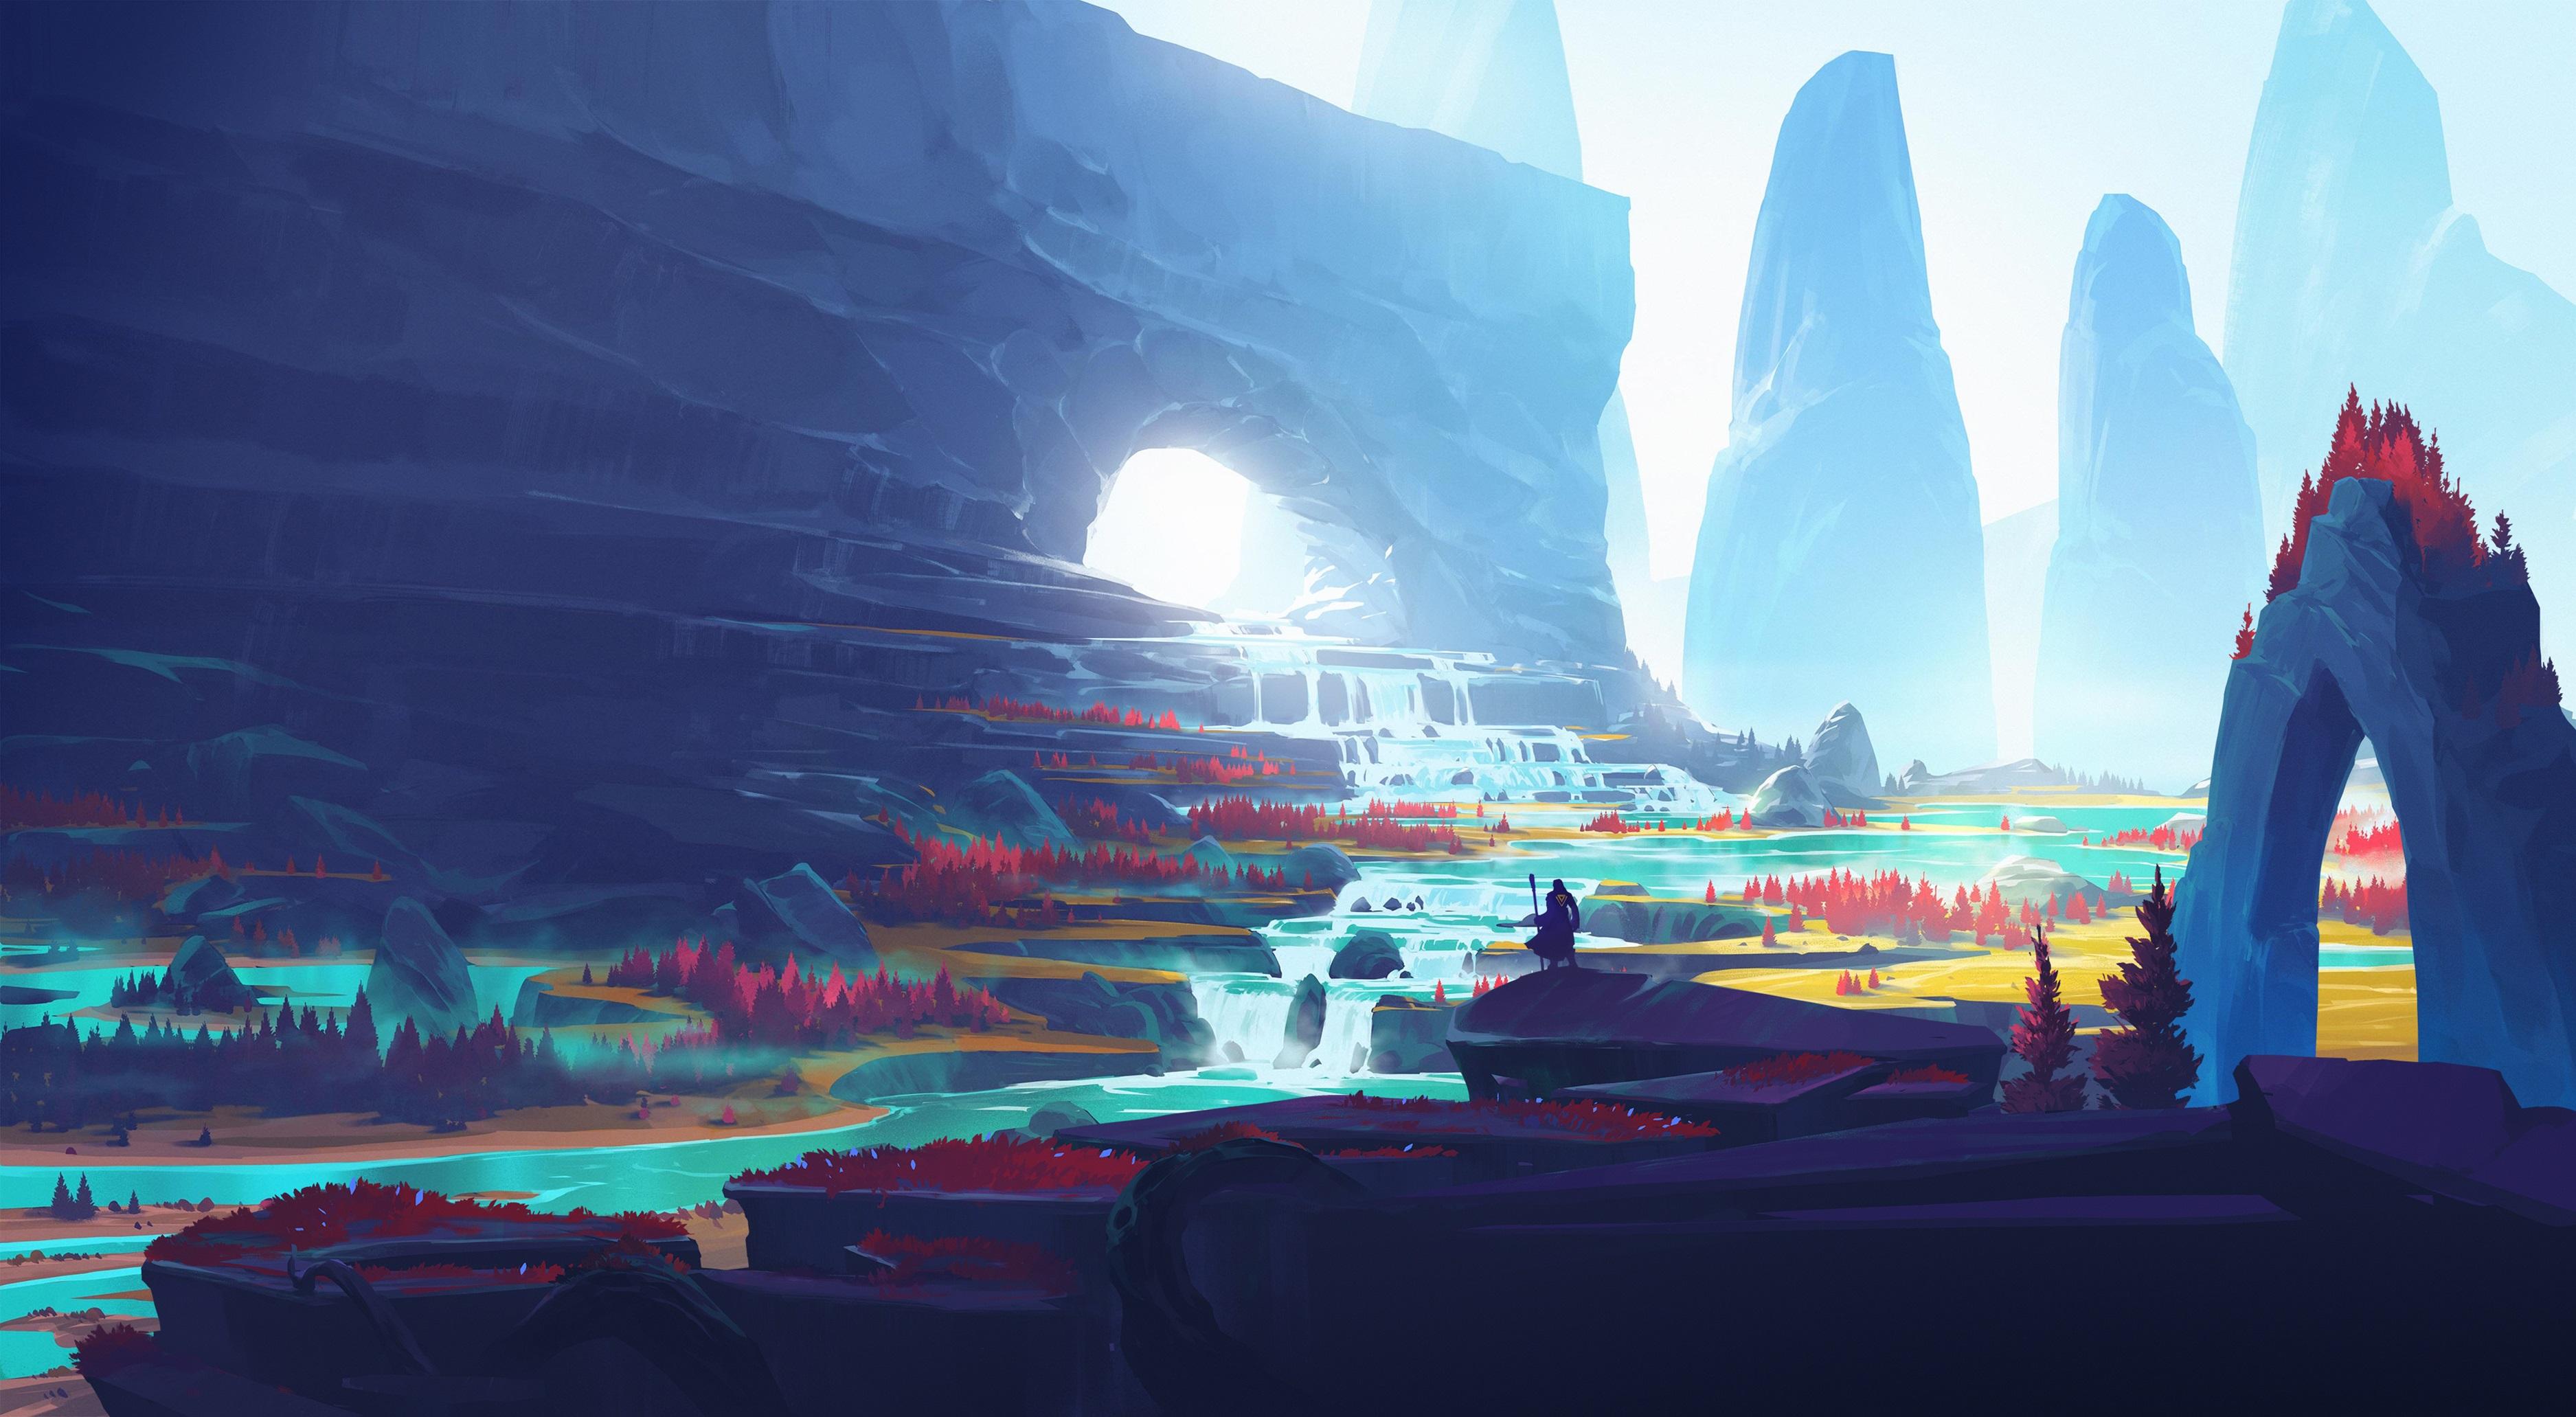 General 3750x2063 digital art landscape mountains Duelyst video games illustration artwork